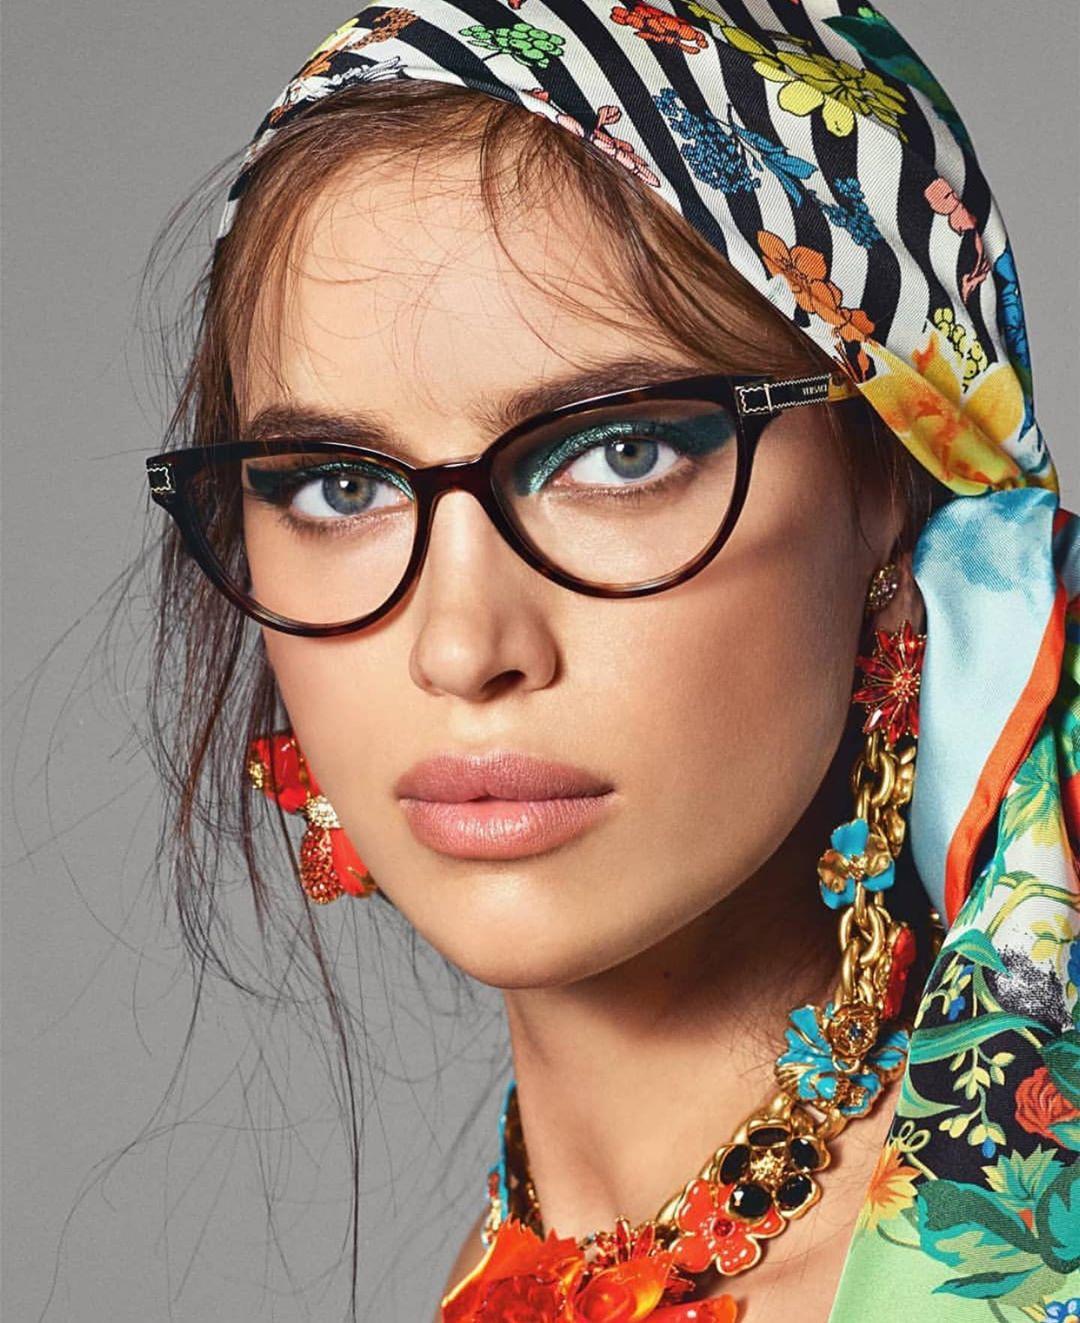 Irina-Shayk-Wallpapers-Insta-Fit-BIo-10